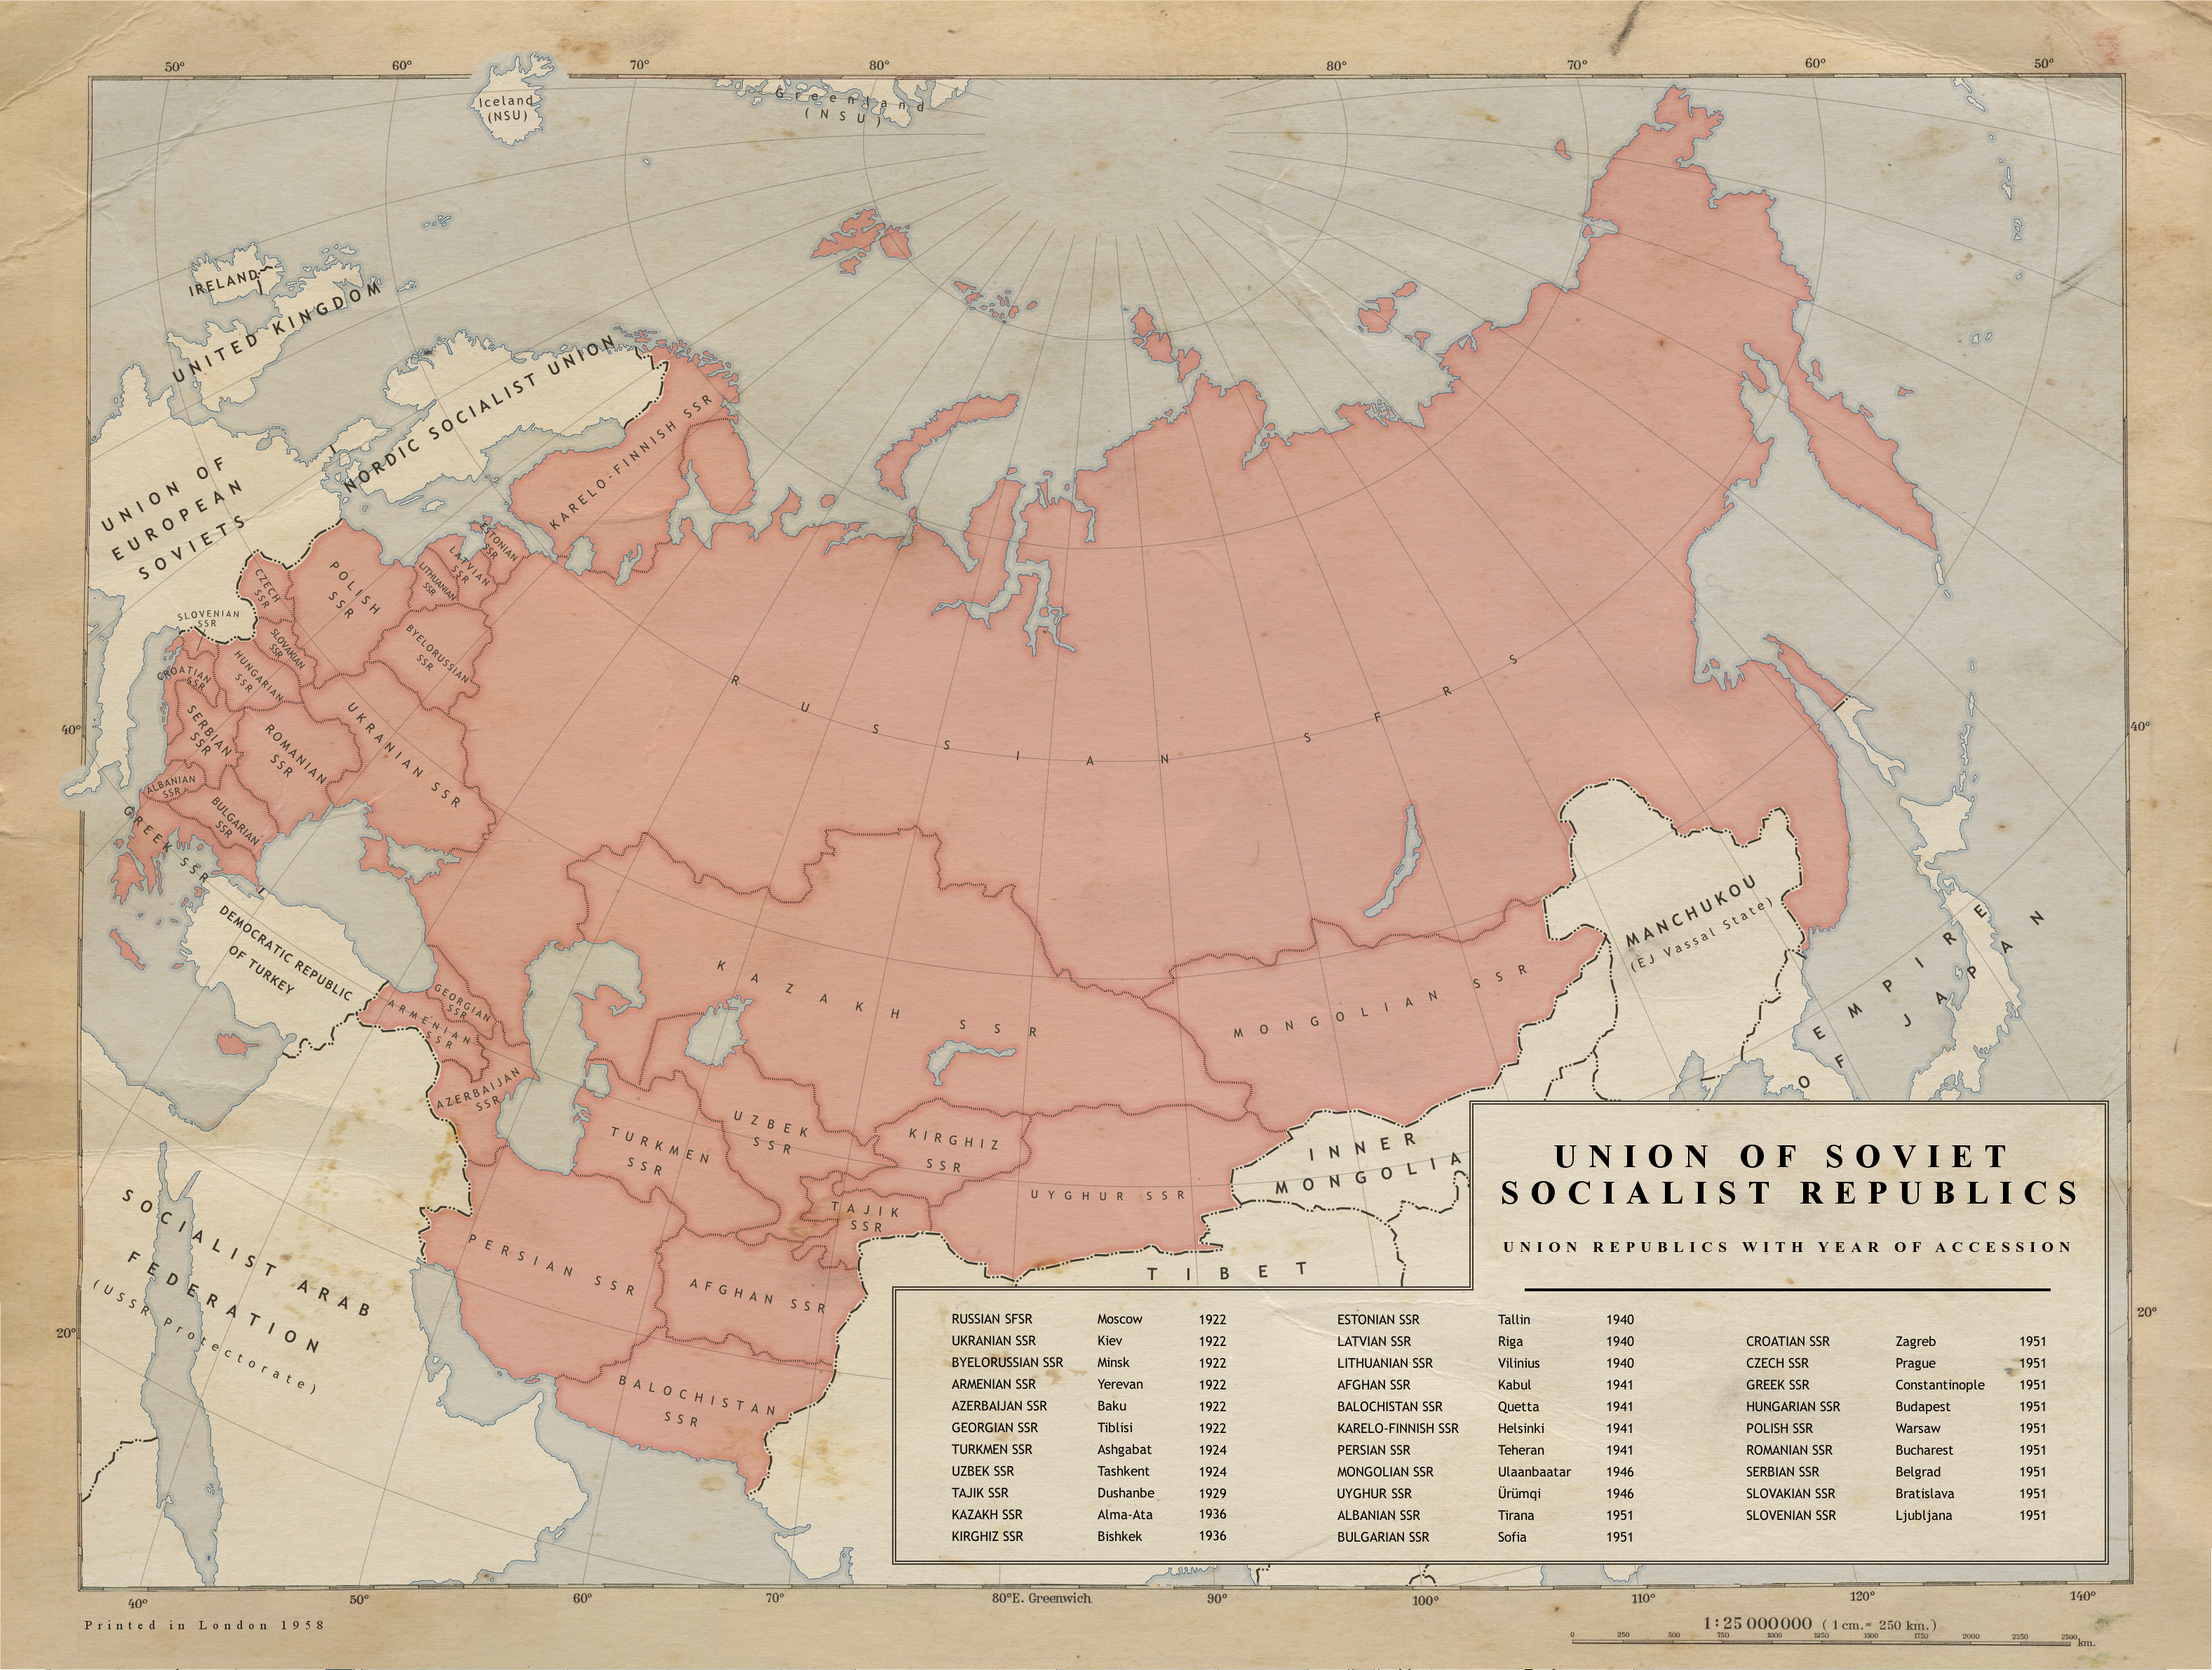 1. USSR Union Republics 1958 by Kuusinen